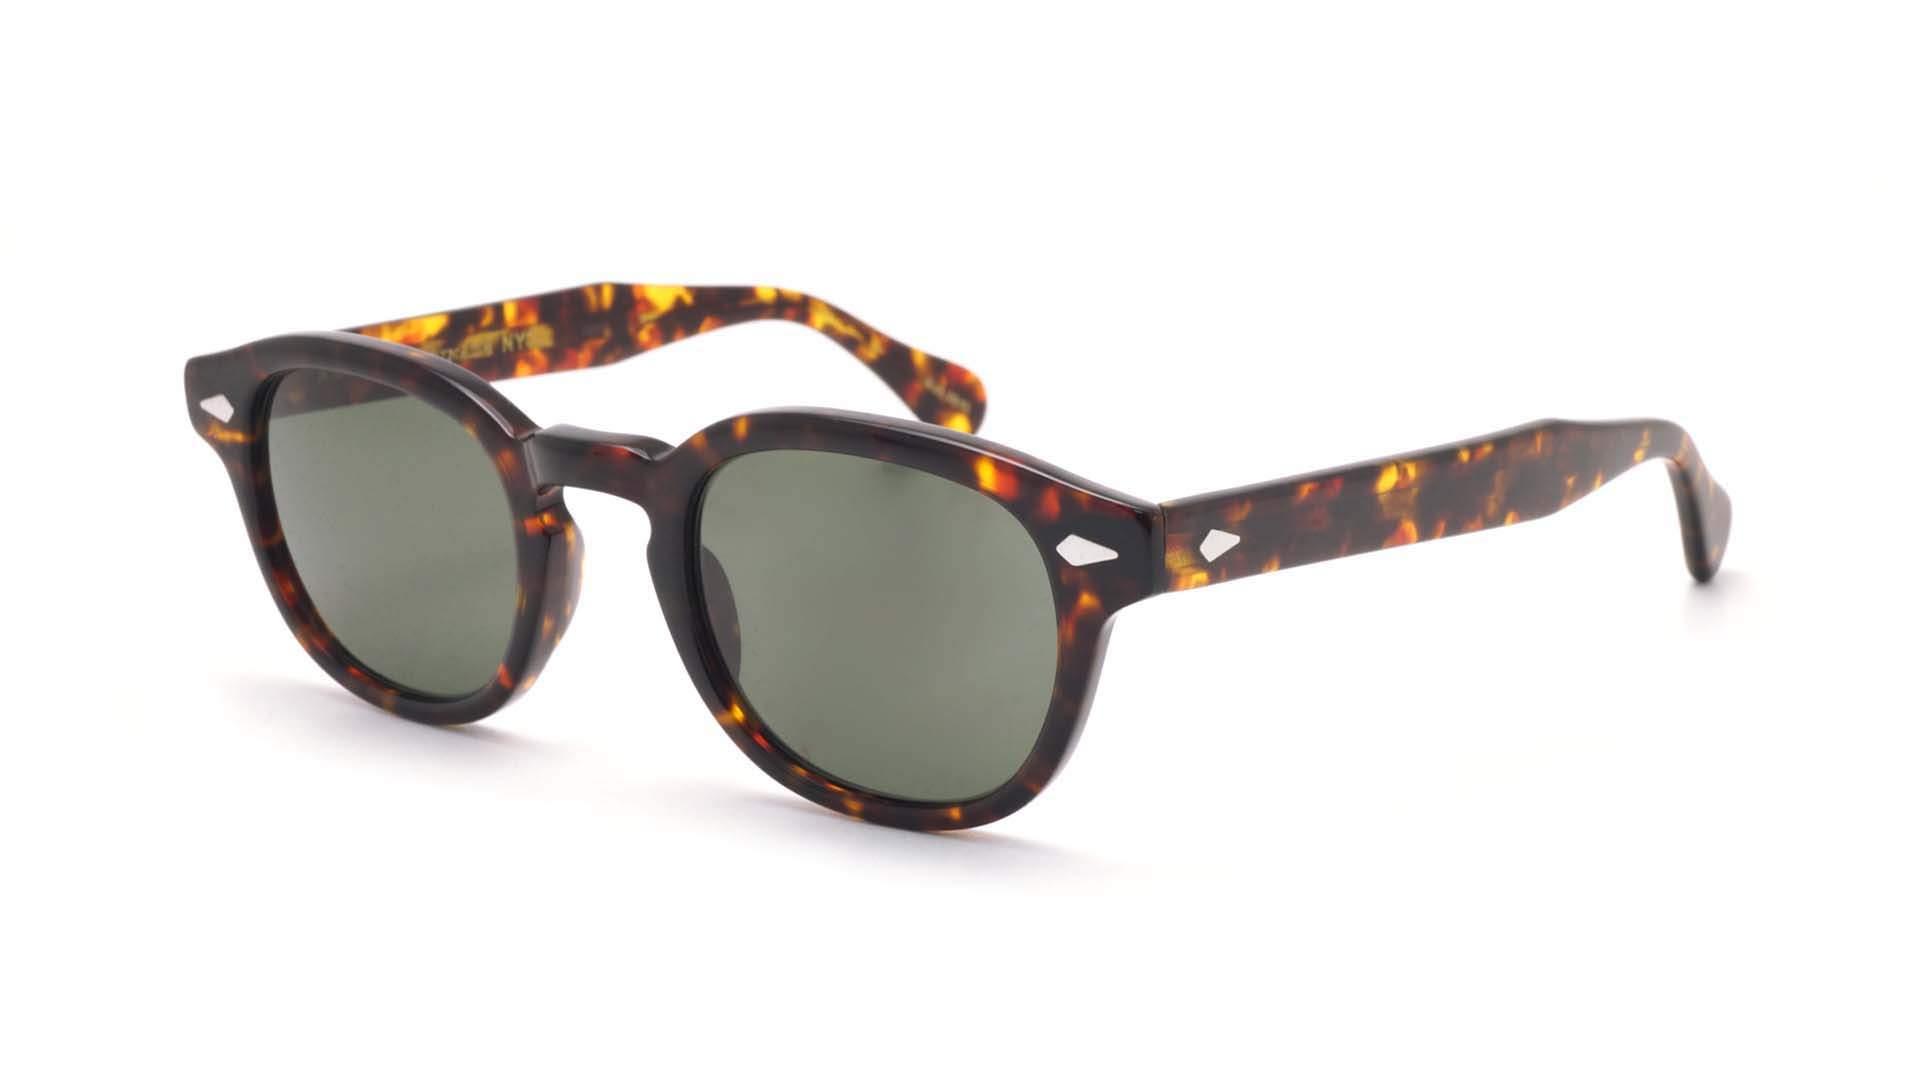 01543fd508c Sunglasses Moscot Lemtosh Tortoise G15 LEM 2002-46-AC-SUN-02 46-24 Small